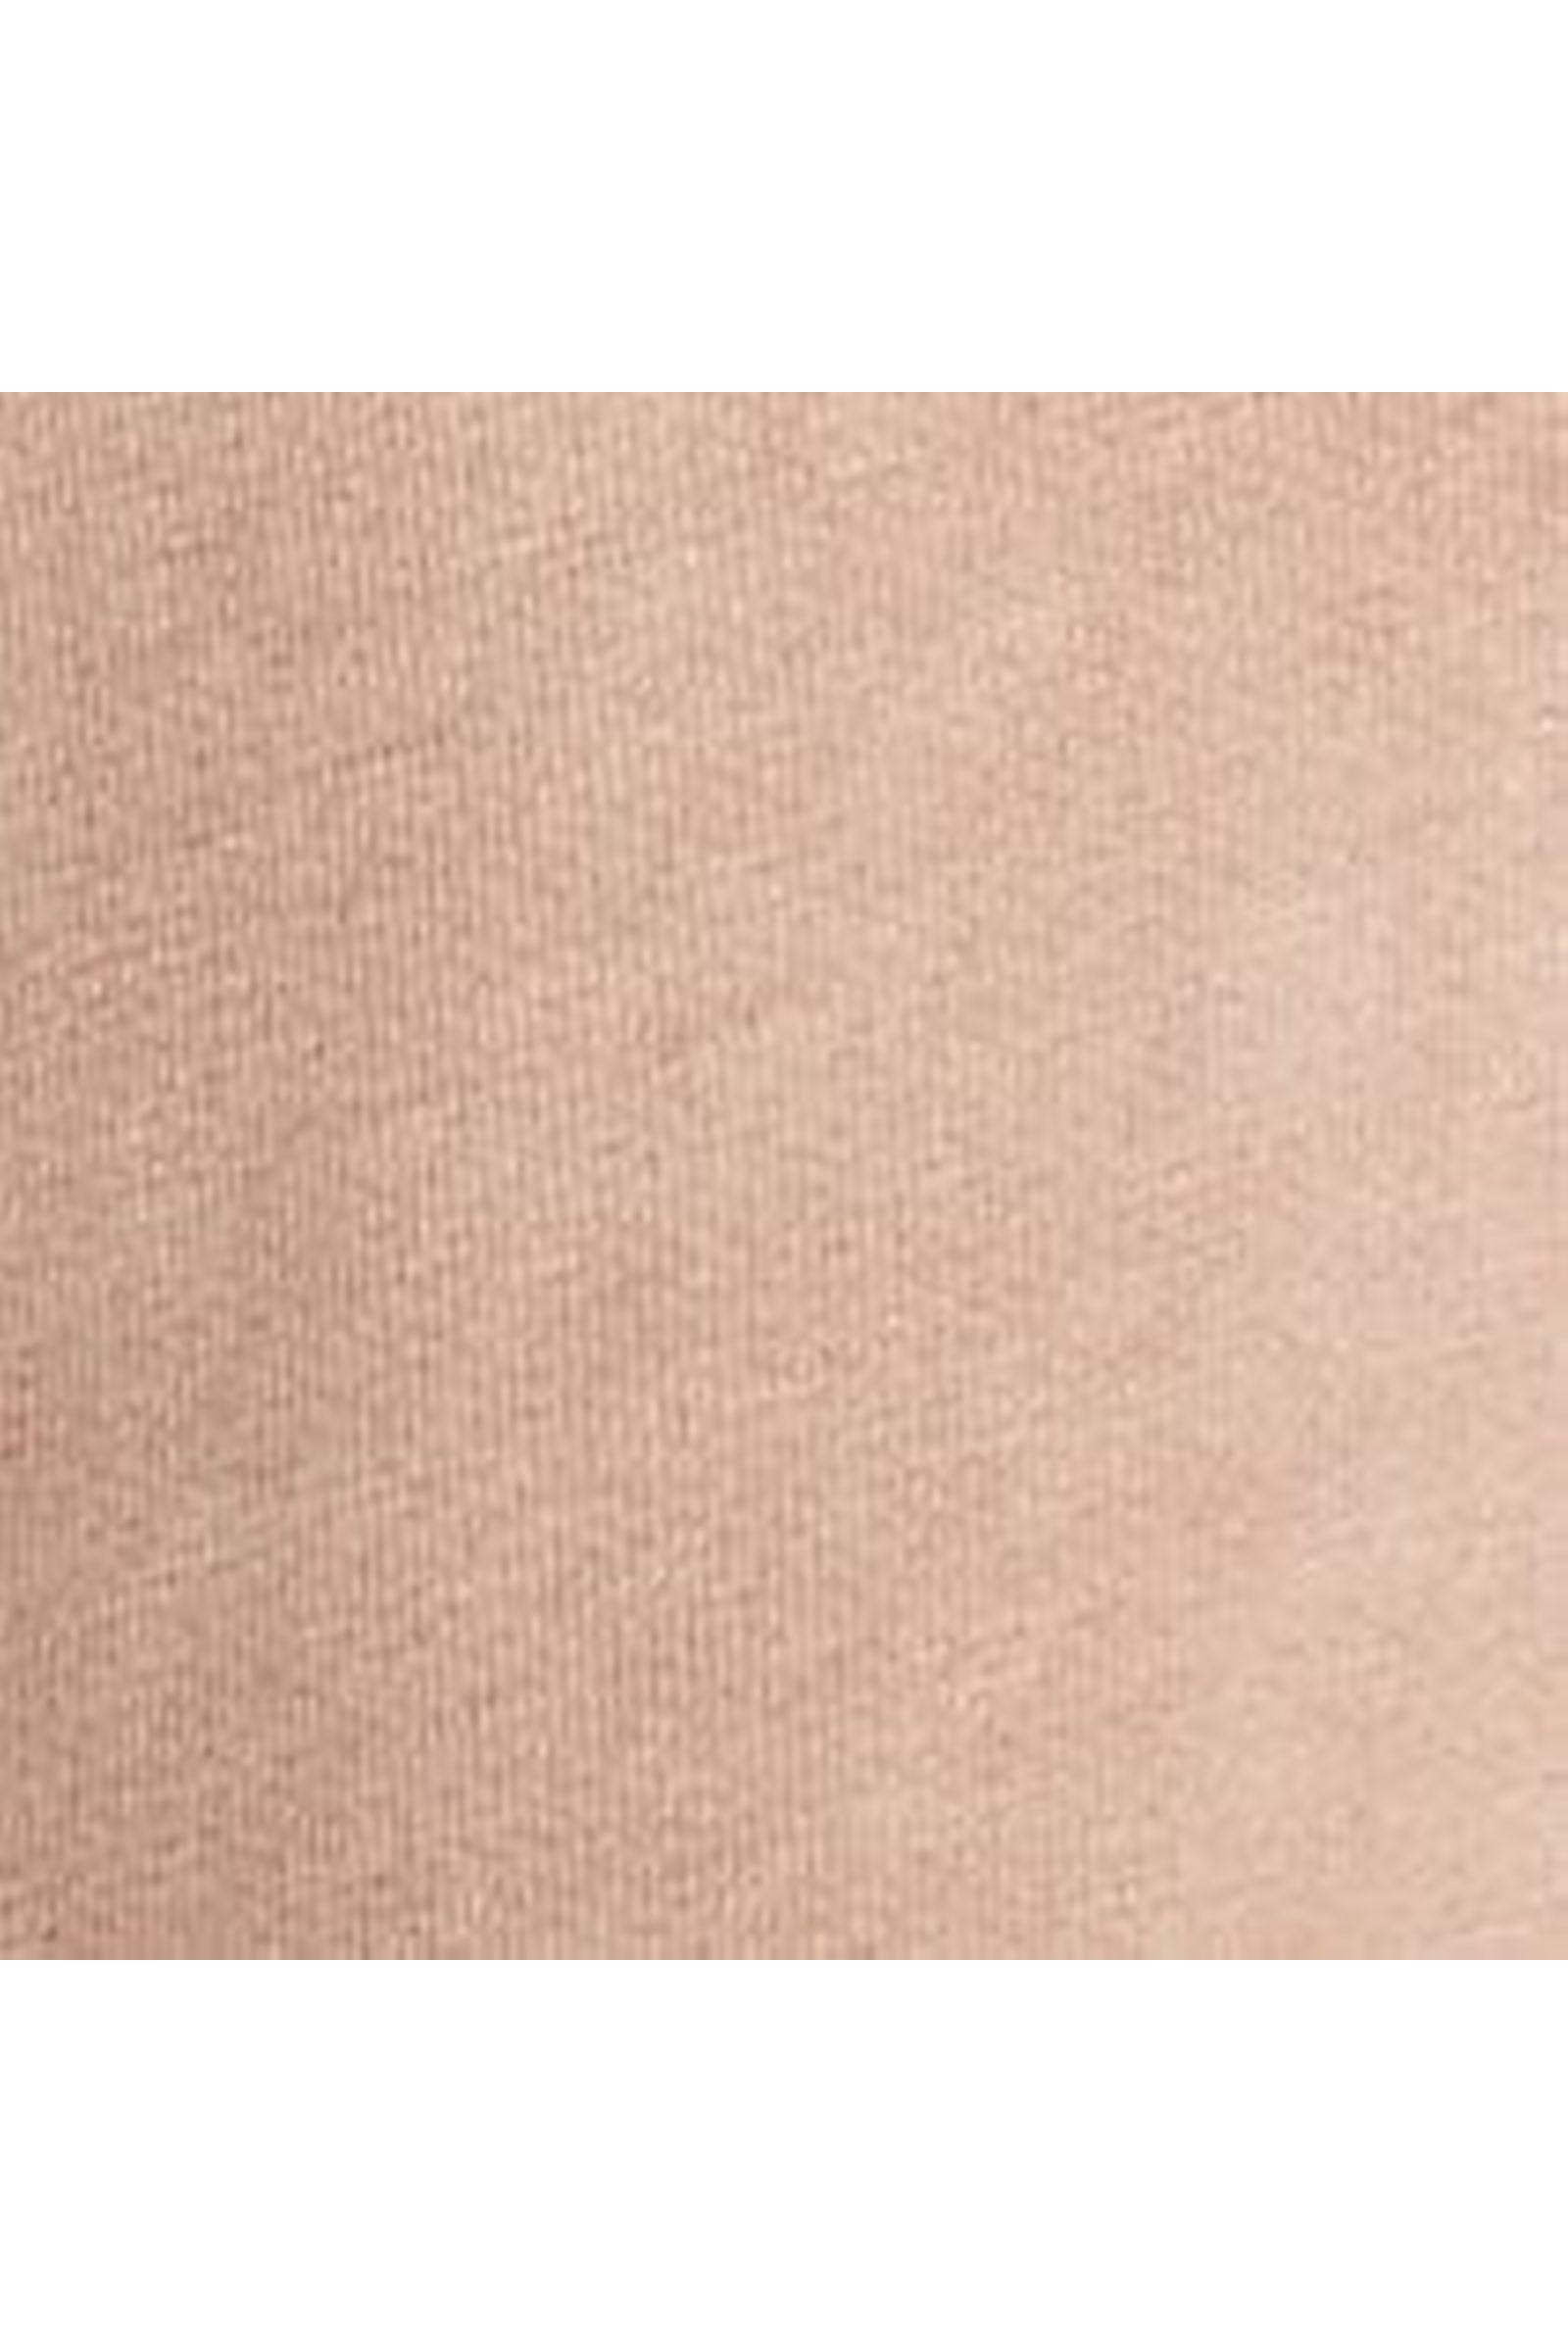 COS 코튼 리넨 스웻셔츠의 핑크컬러 Detail입니다.